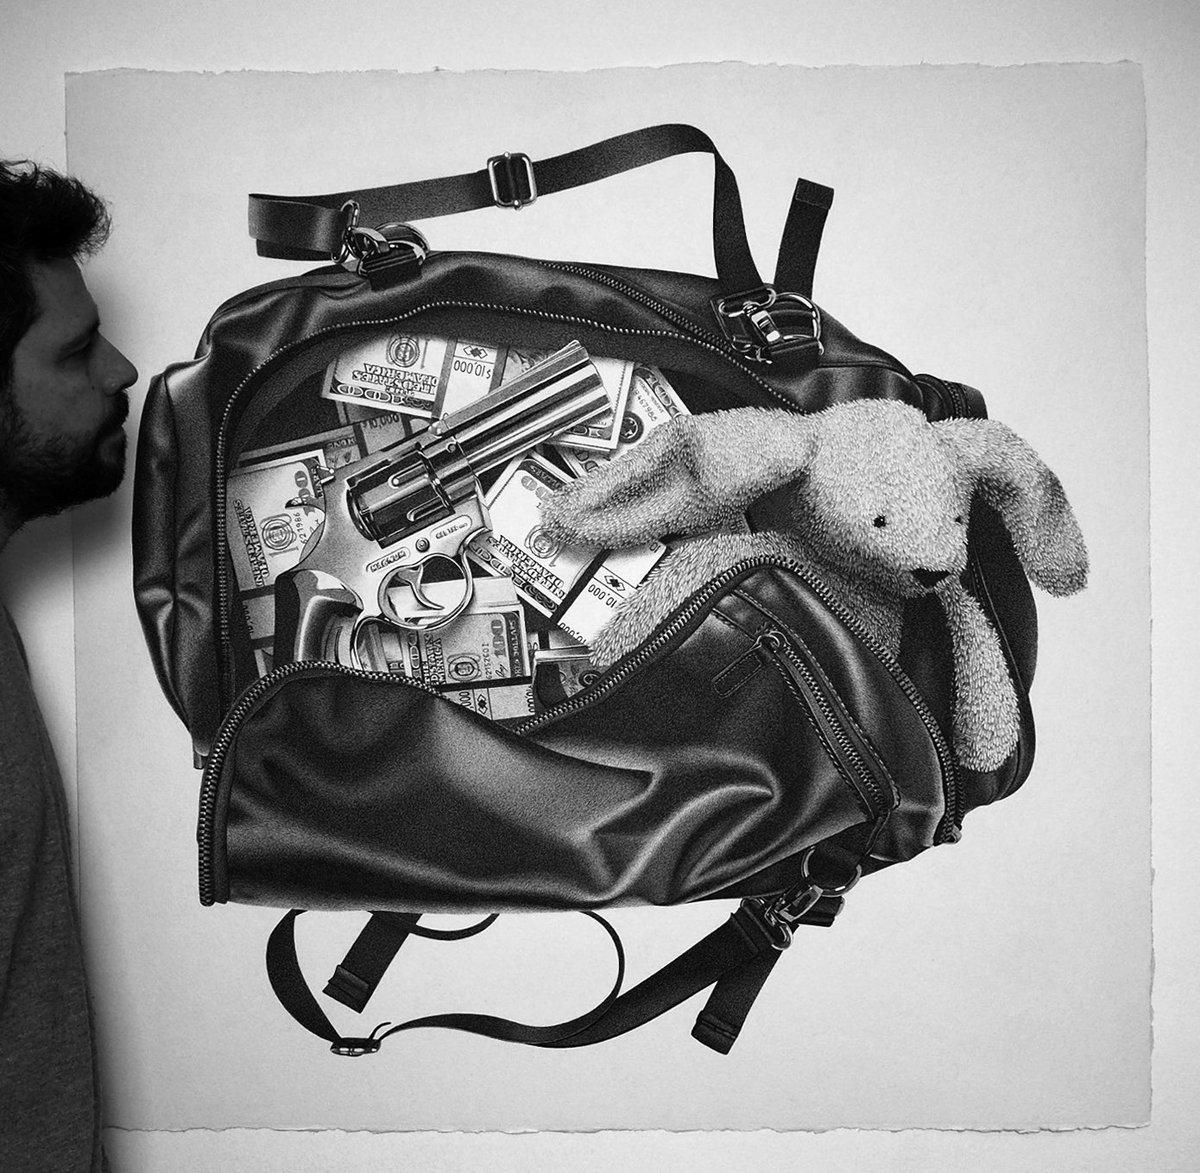 https://t.co/lZPrEKBajU | #AlessandroPaglia | #illustration #pop #art https://t.co/oUtrlnucSC